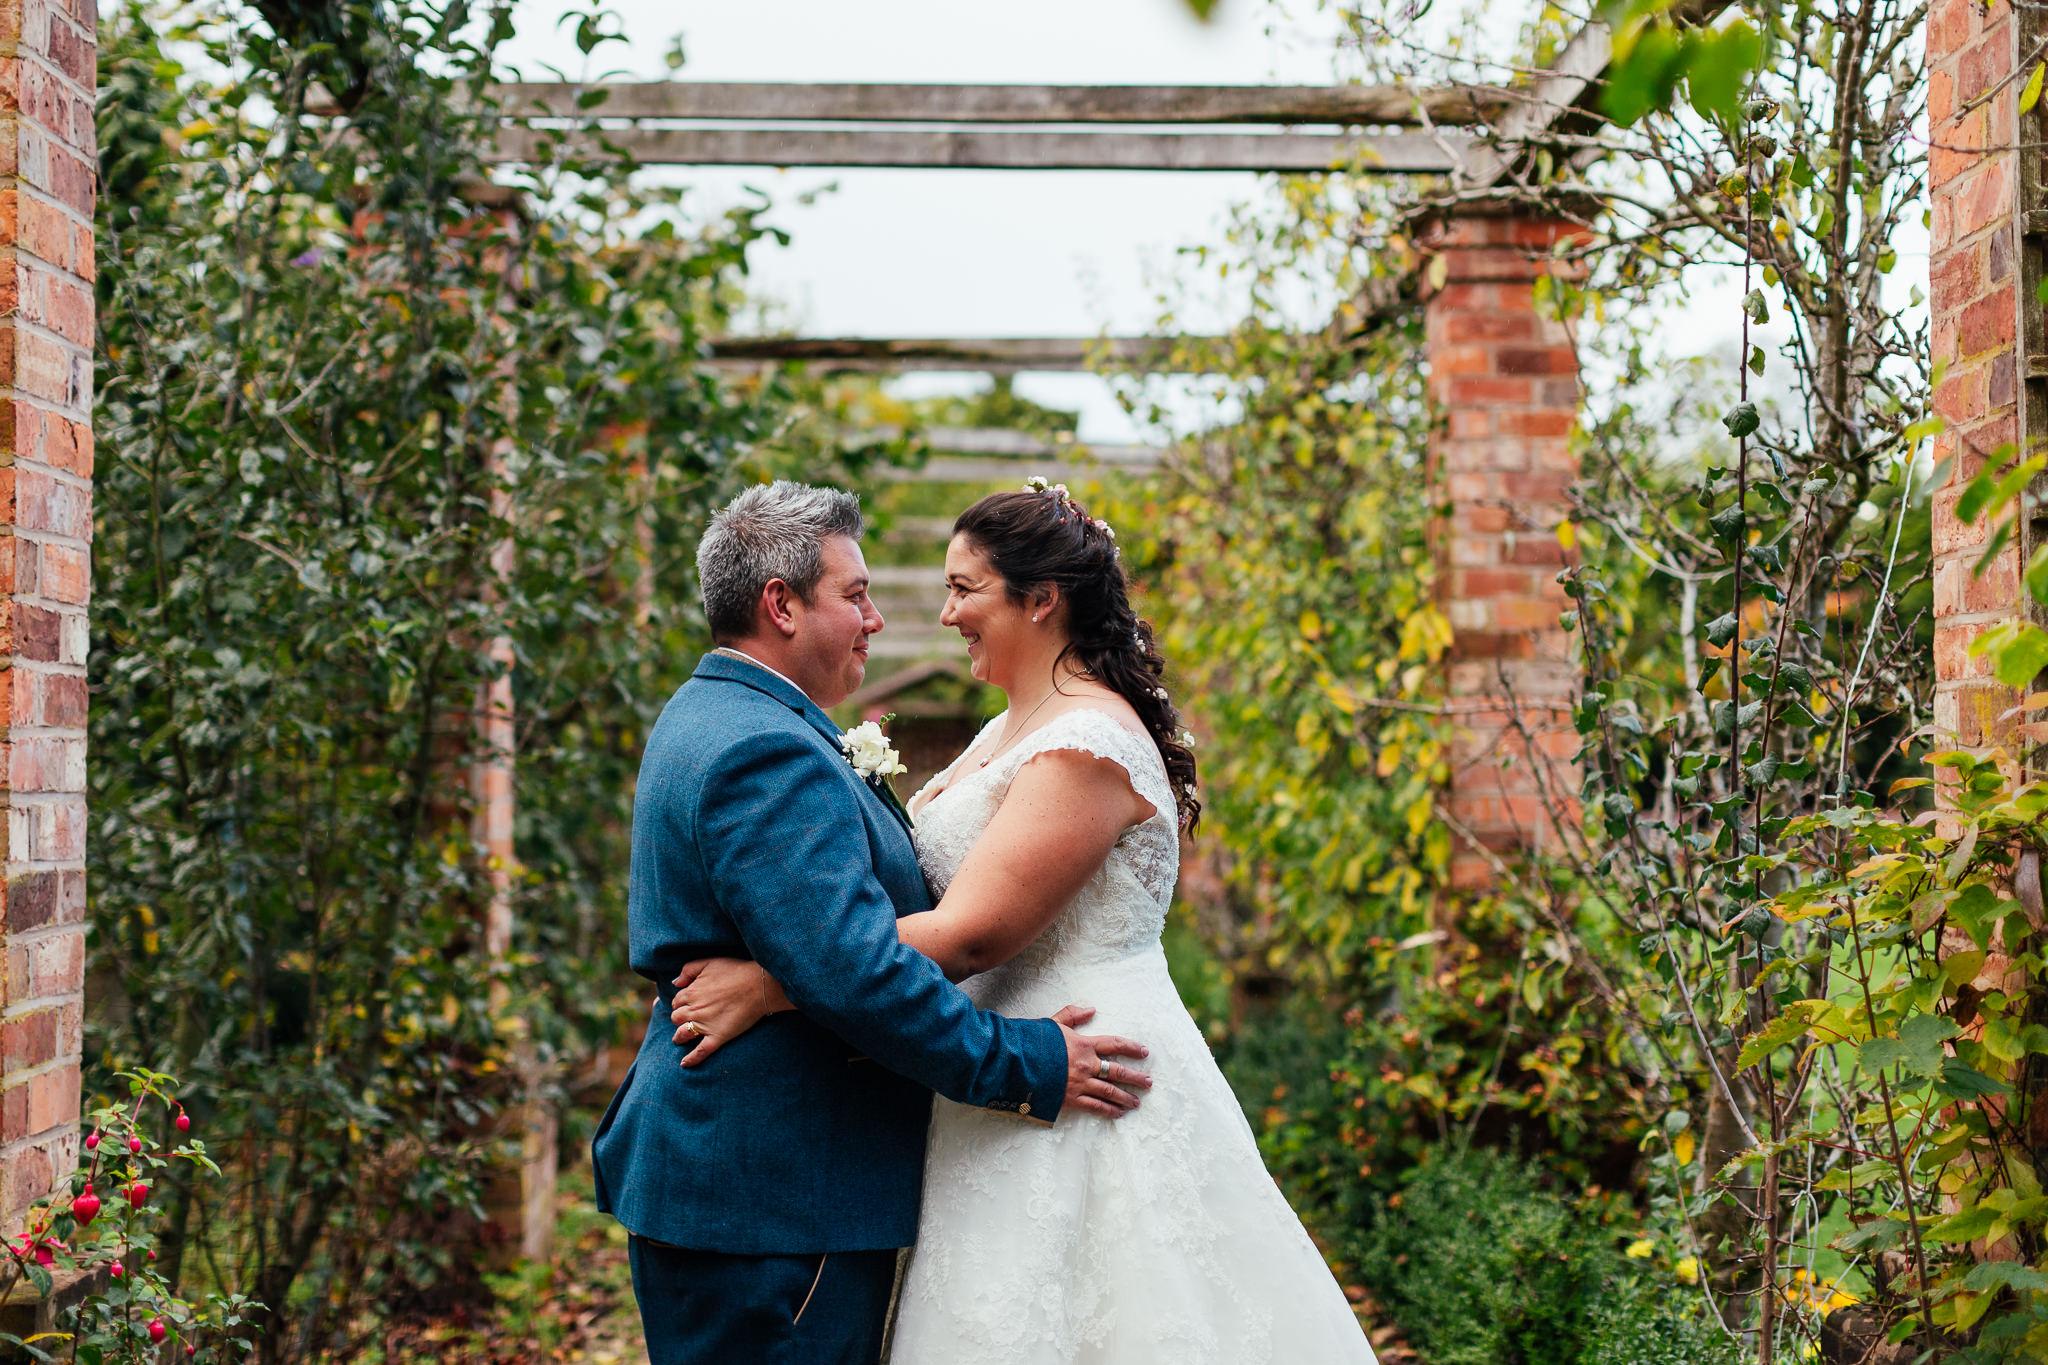 Willington-Hall-Cheshire-Wedding-27.jpg